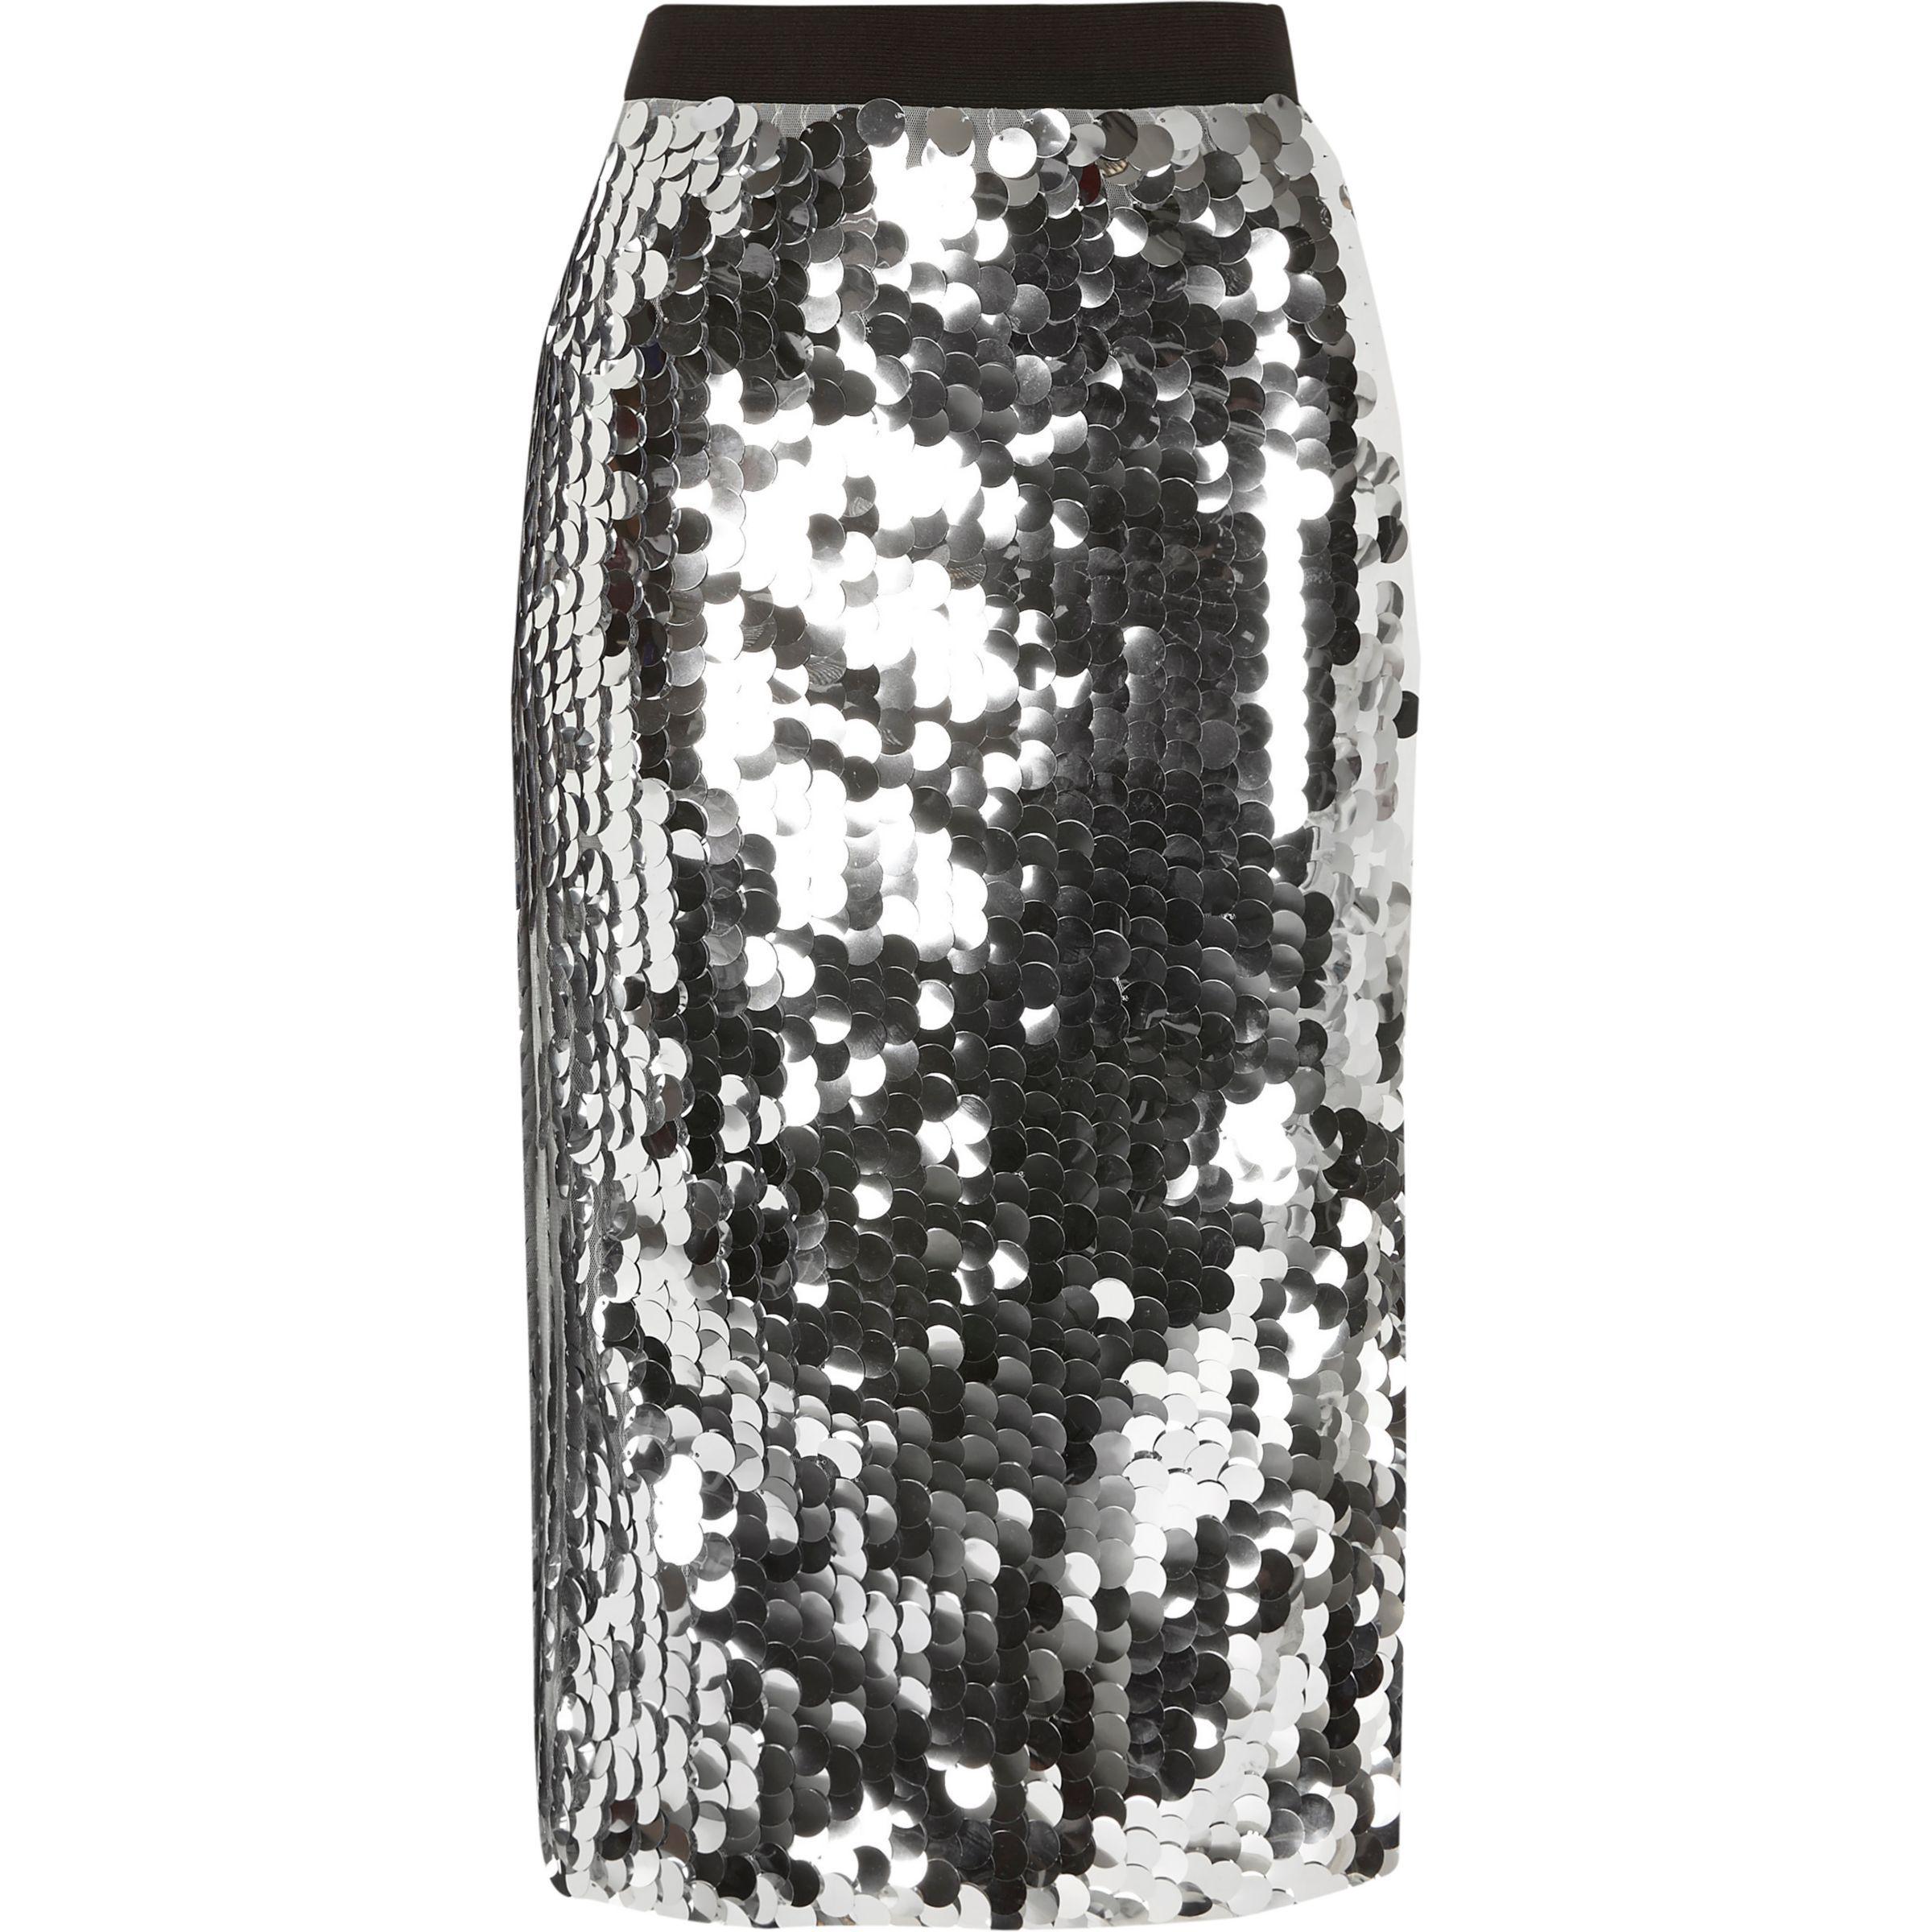 3700b95cc17f River Island Silver Sequin Midi Pencil Skirt in Metallic - Lyst